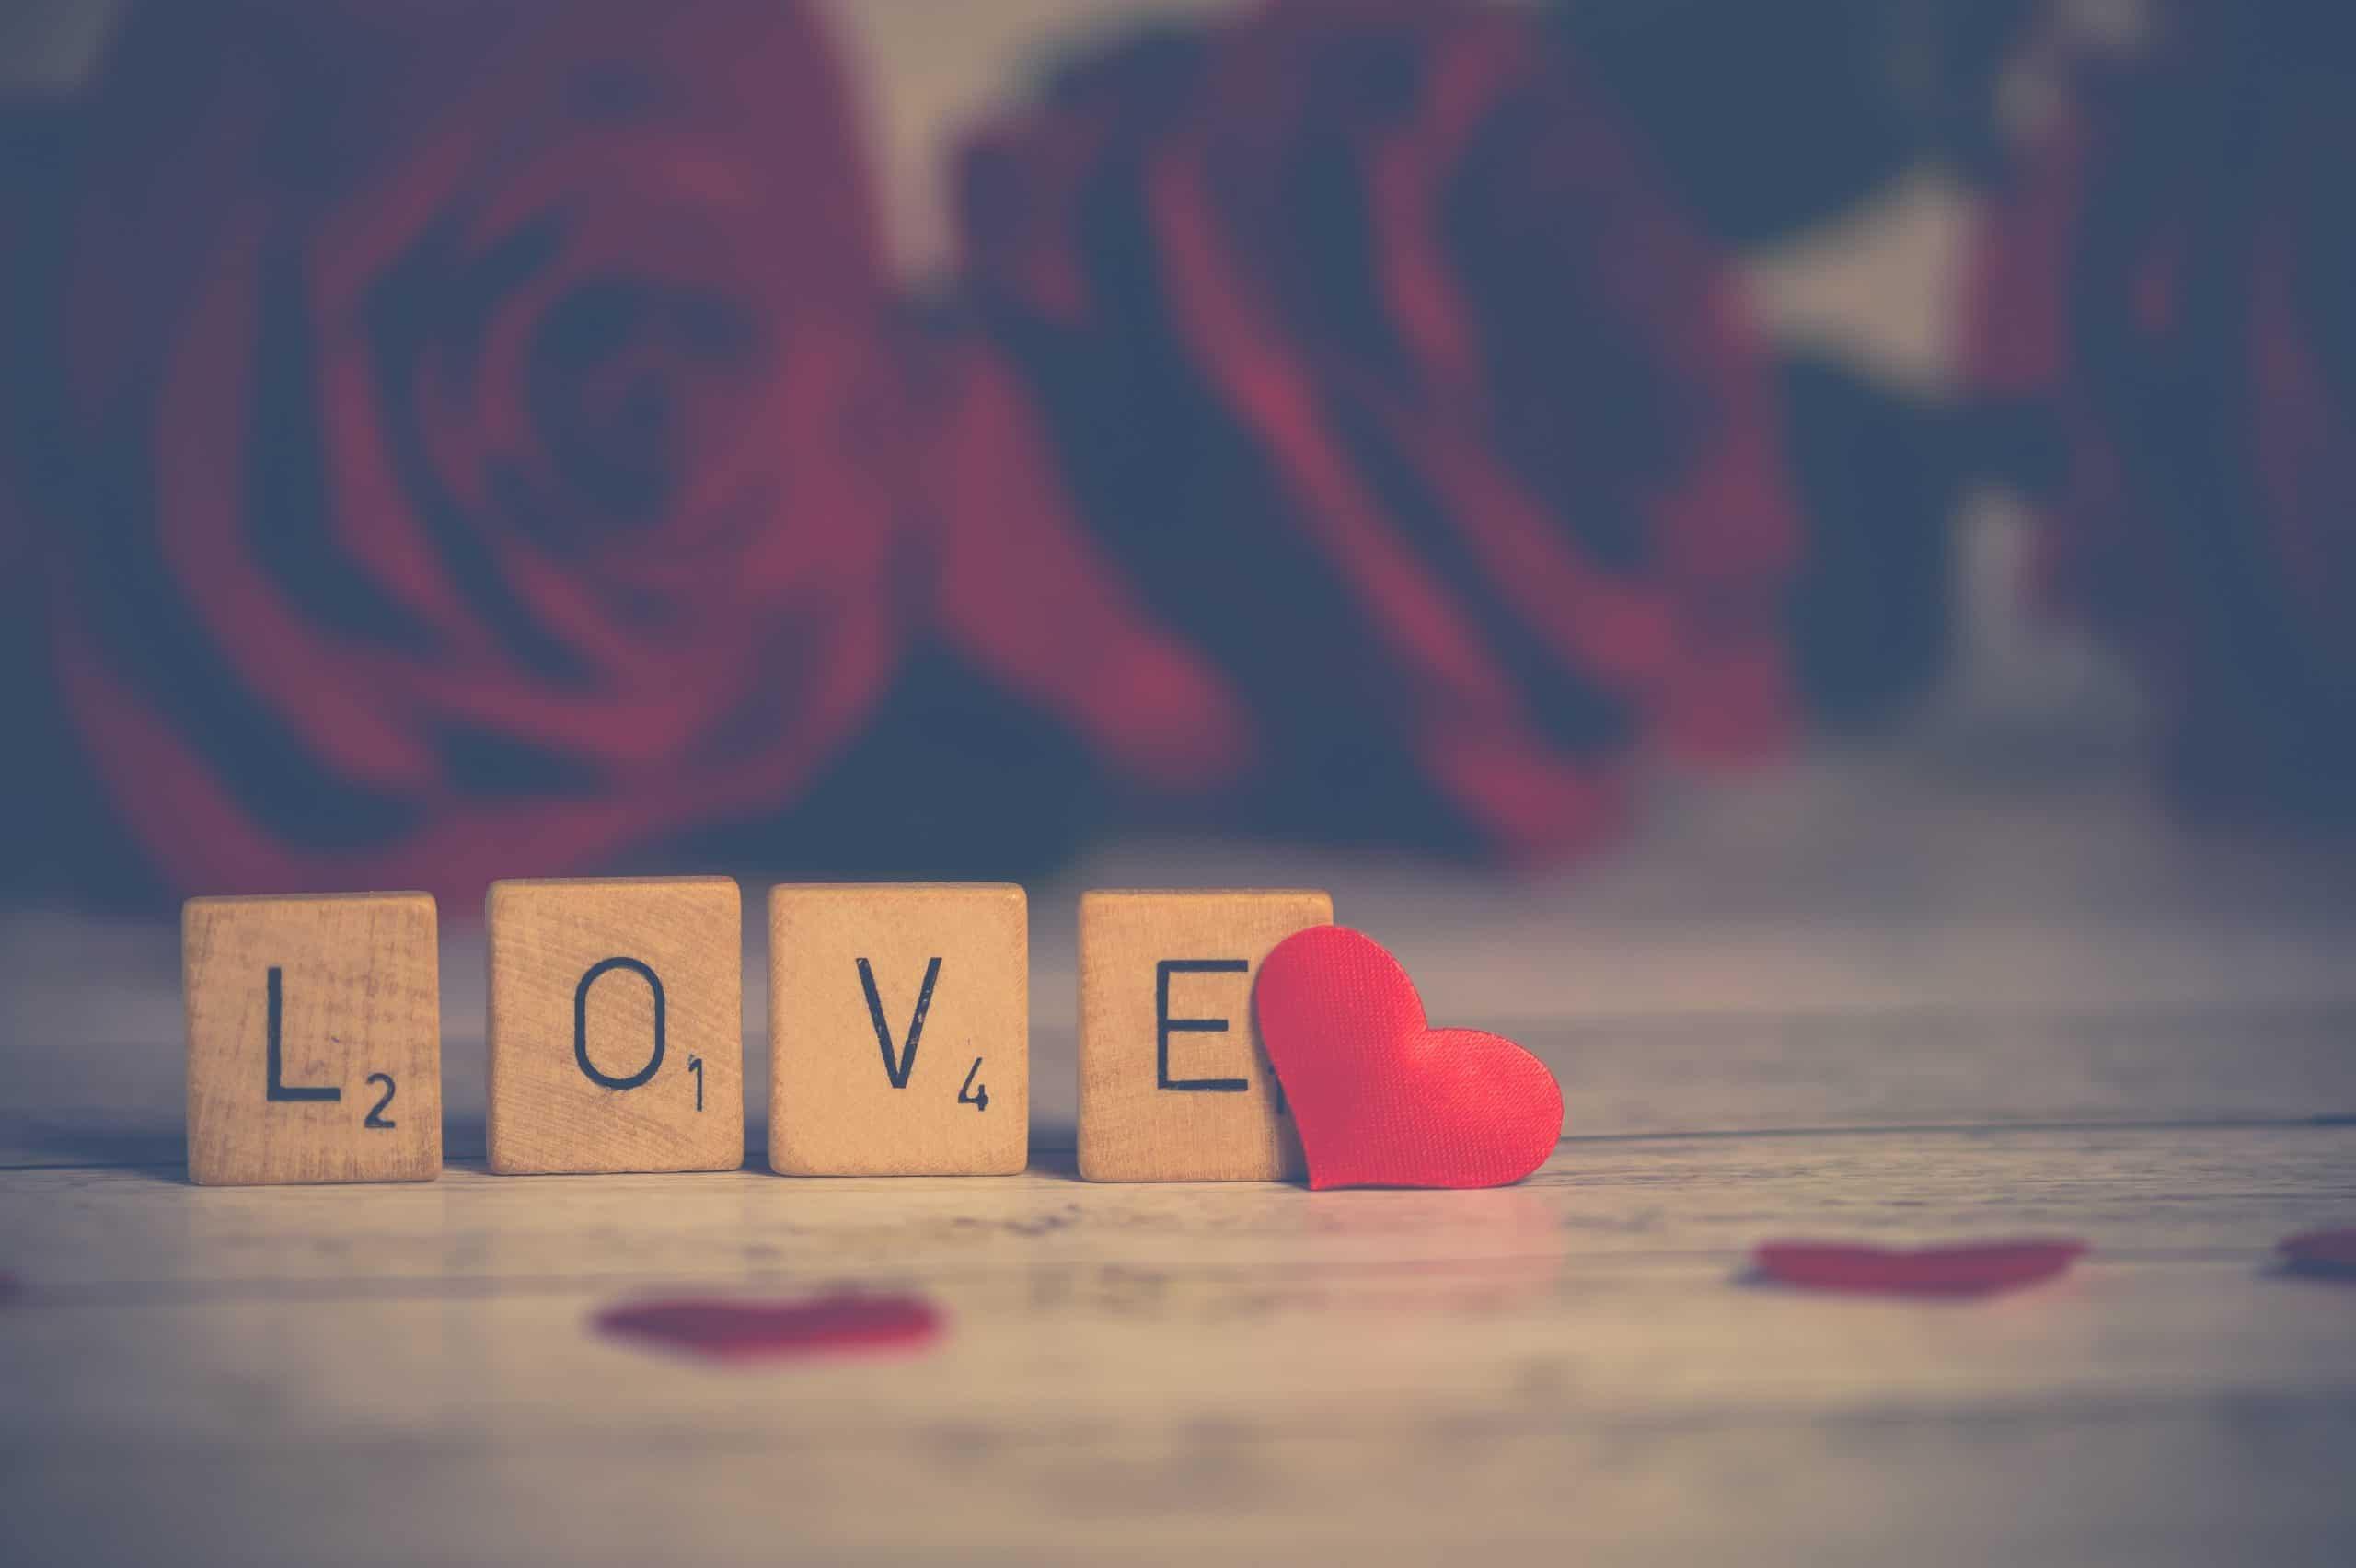 Valentines day image